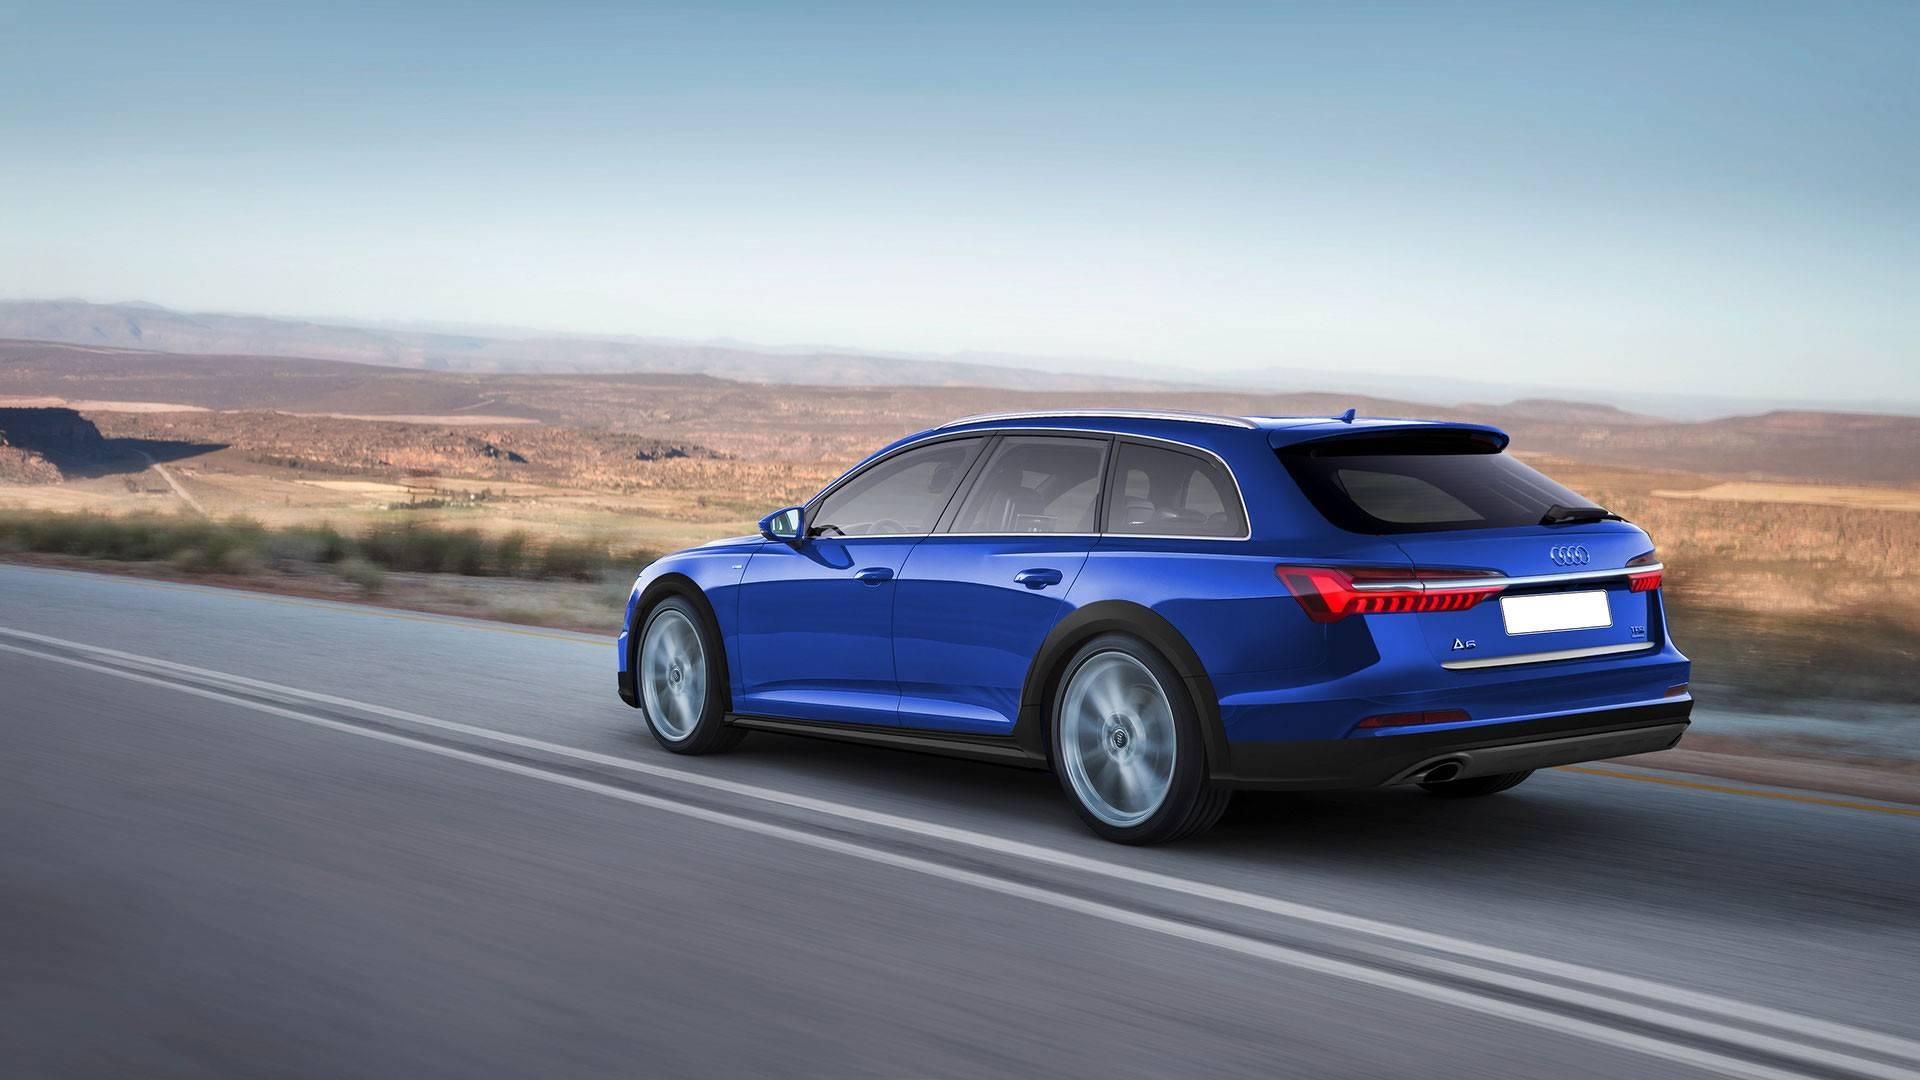 Audi A6 Avant, A6 Allroad RS6 Avant Renderings (4)